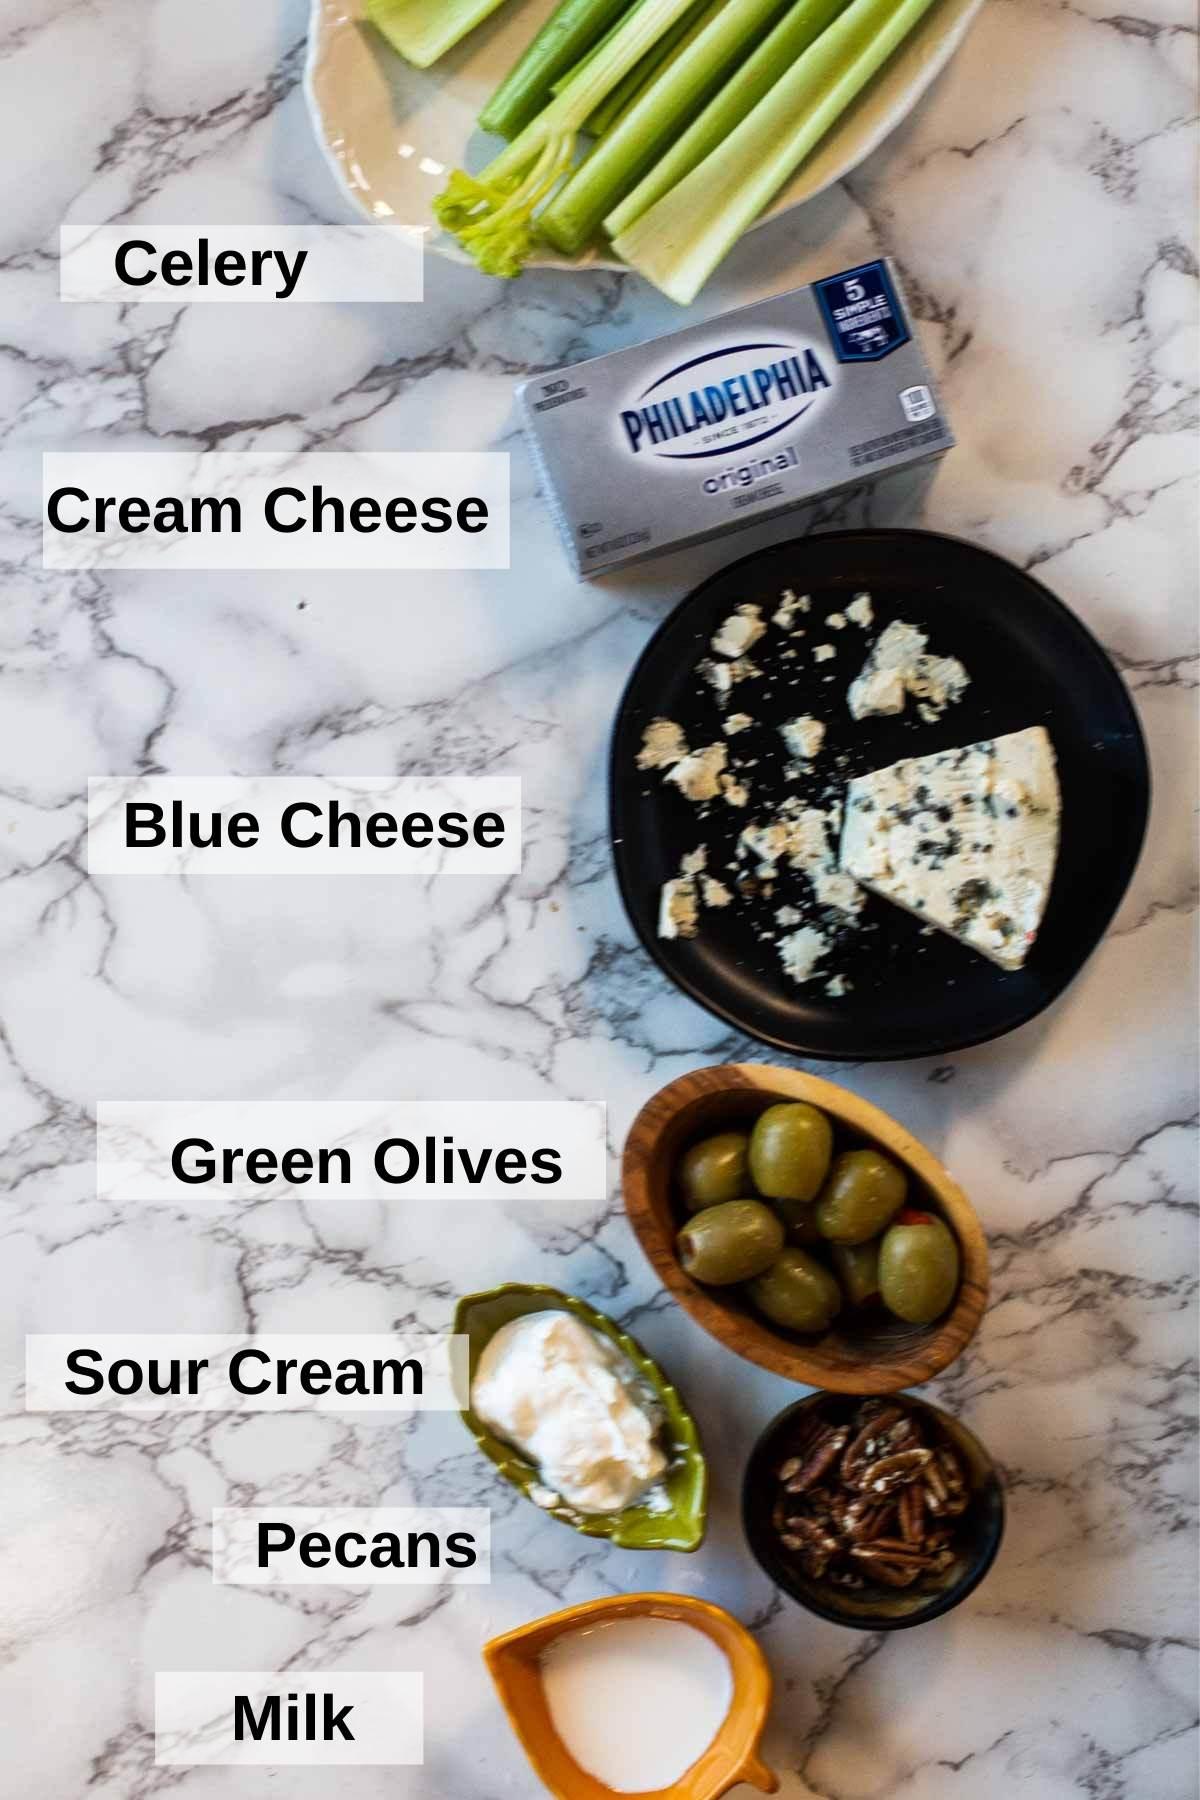 Ingredients to make stuffed celery sticks appetizer recipe